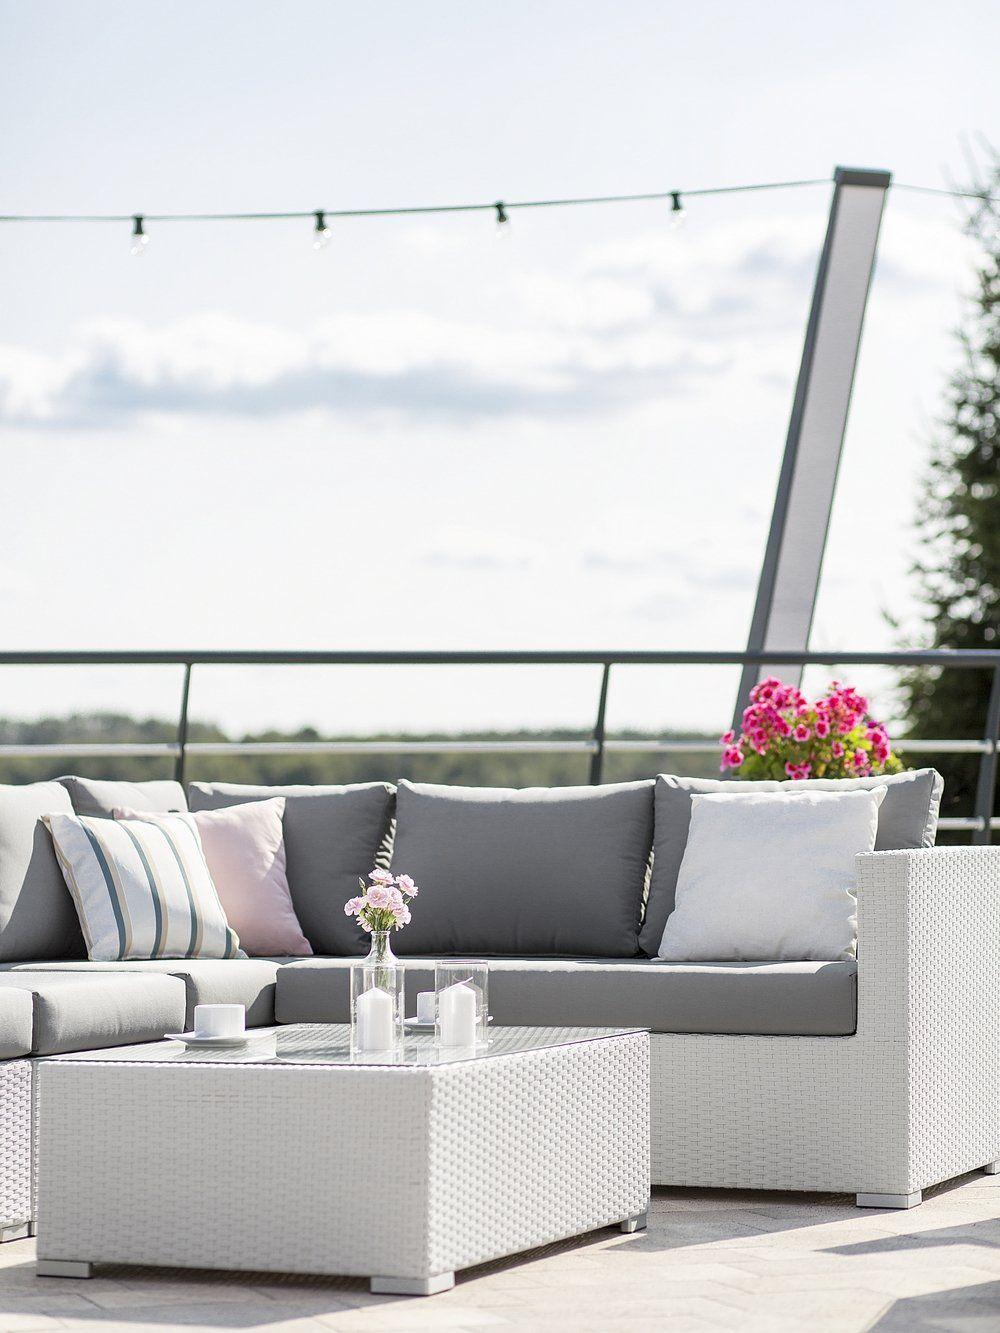 Set Giardino Rattan Bianco.Zestaw Ogrodowy Rattanowy 8 Osobowy Bialy Xxl Outdoor Lounge Set Patio Furniture Covers Outdoor Furniture Sets